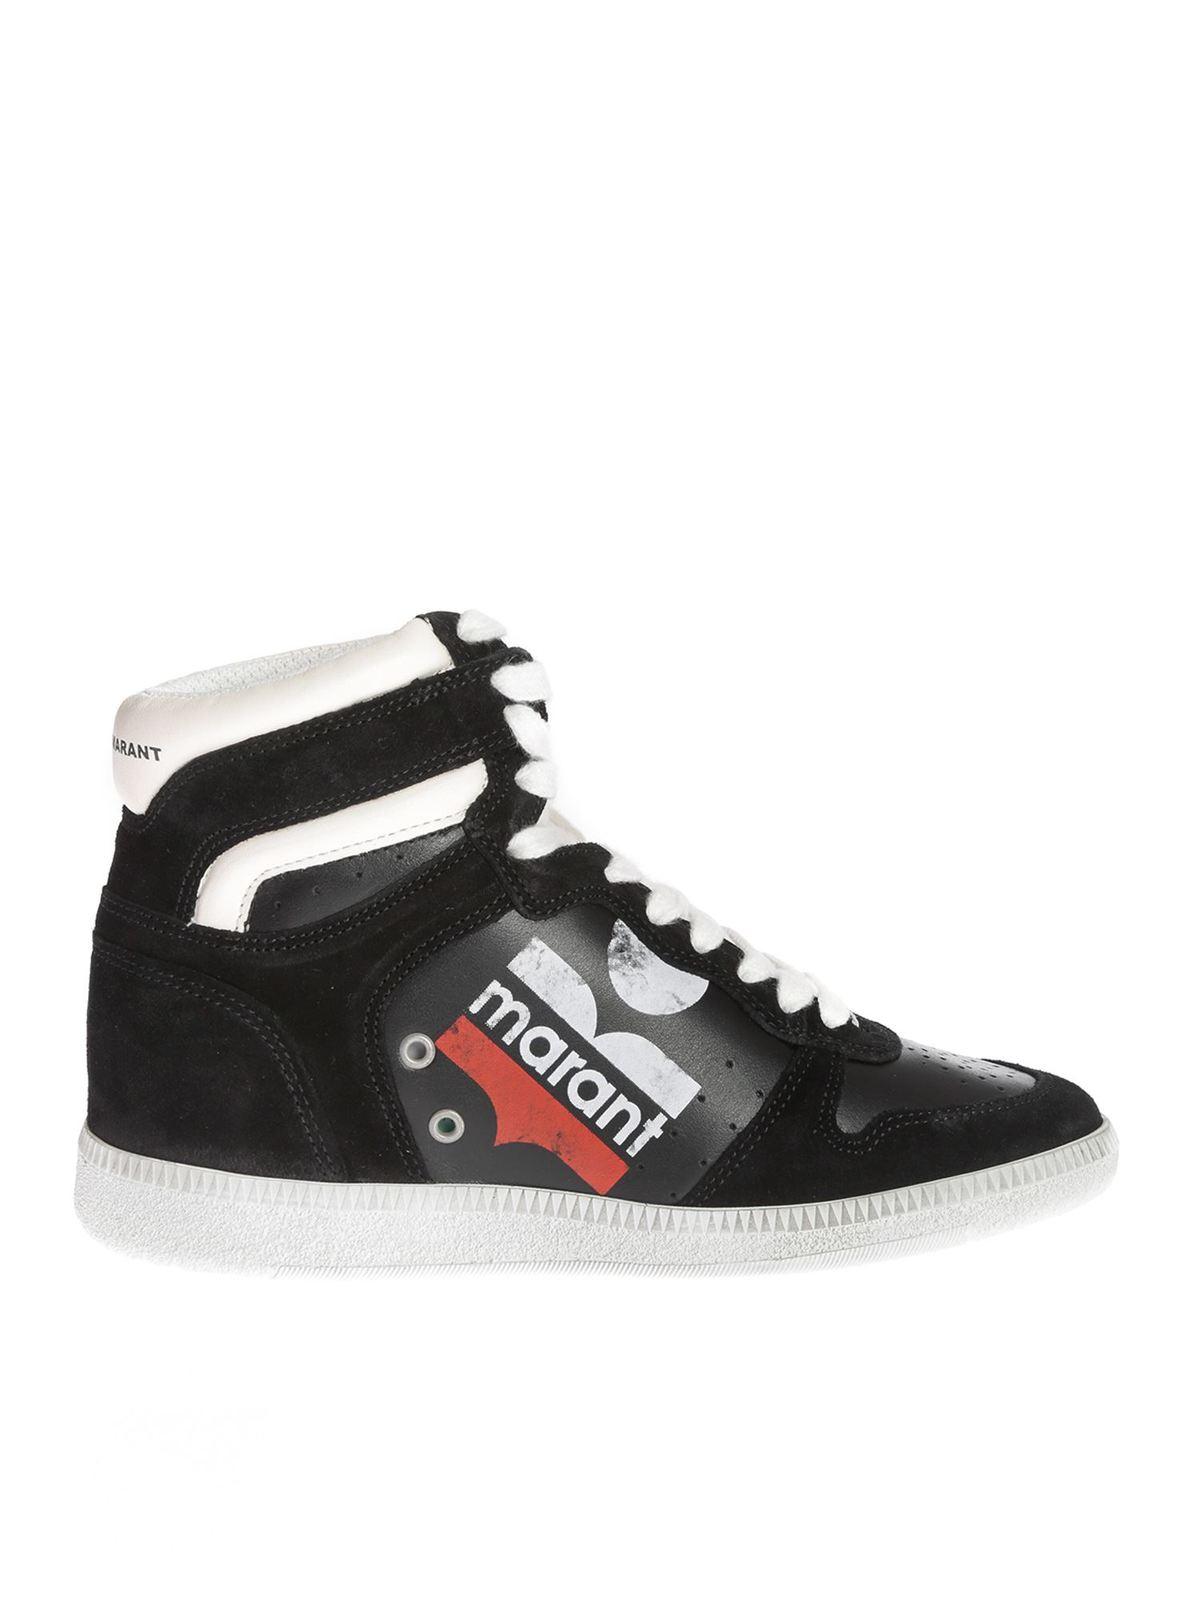 Isabel Marant - Bayten sneakers in